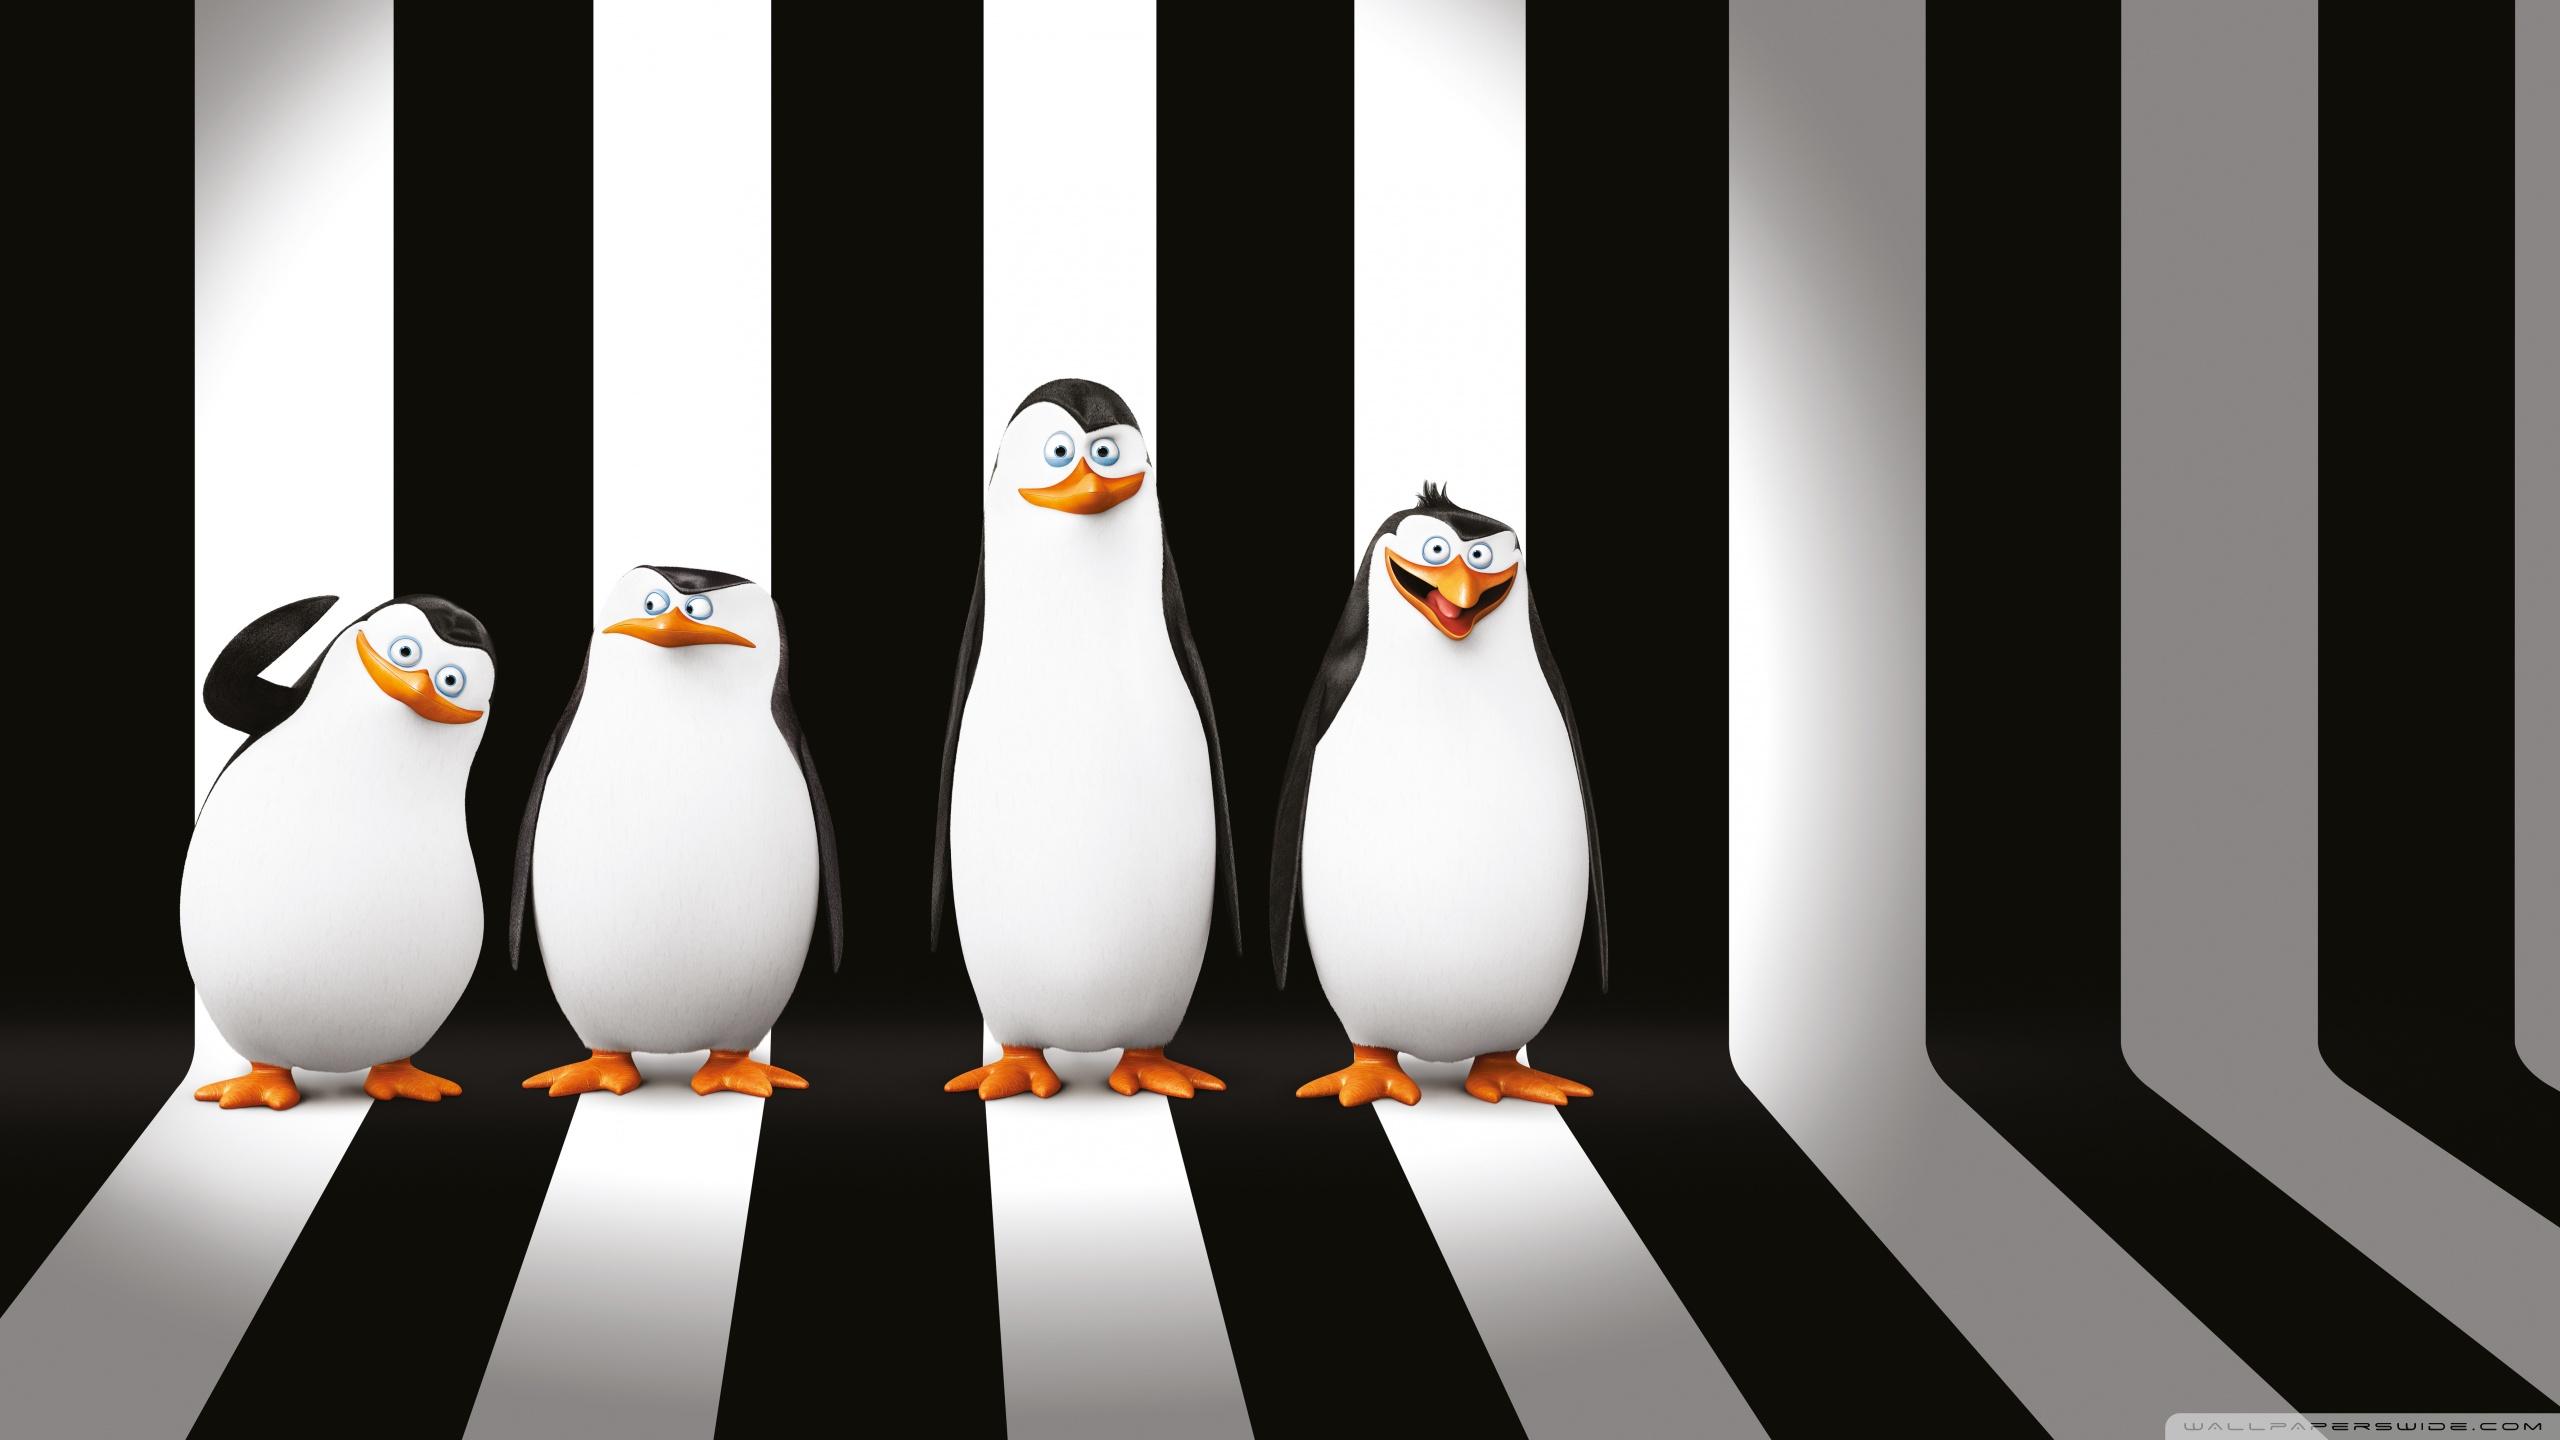 King Julian Hd Wallpaper Penguins Of Madagascar Movie 4k Hd Desktop Wallpaper For